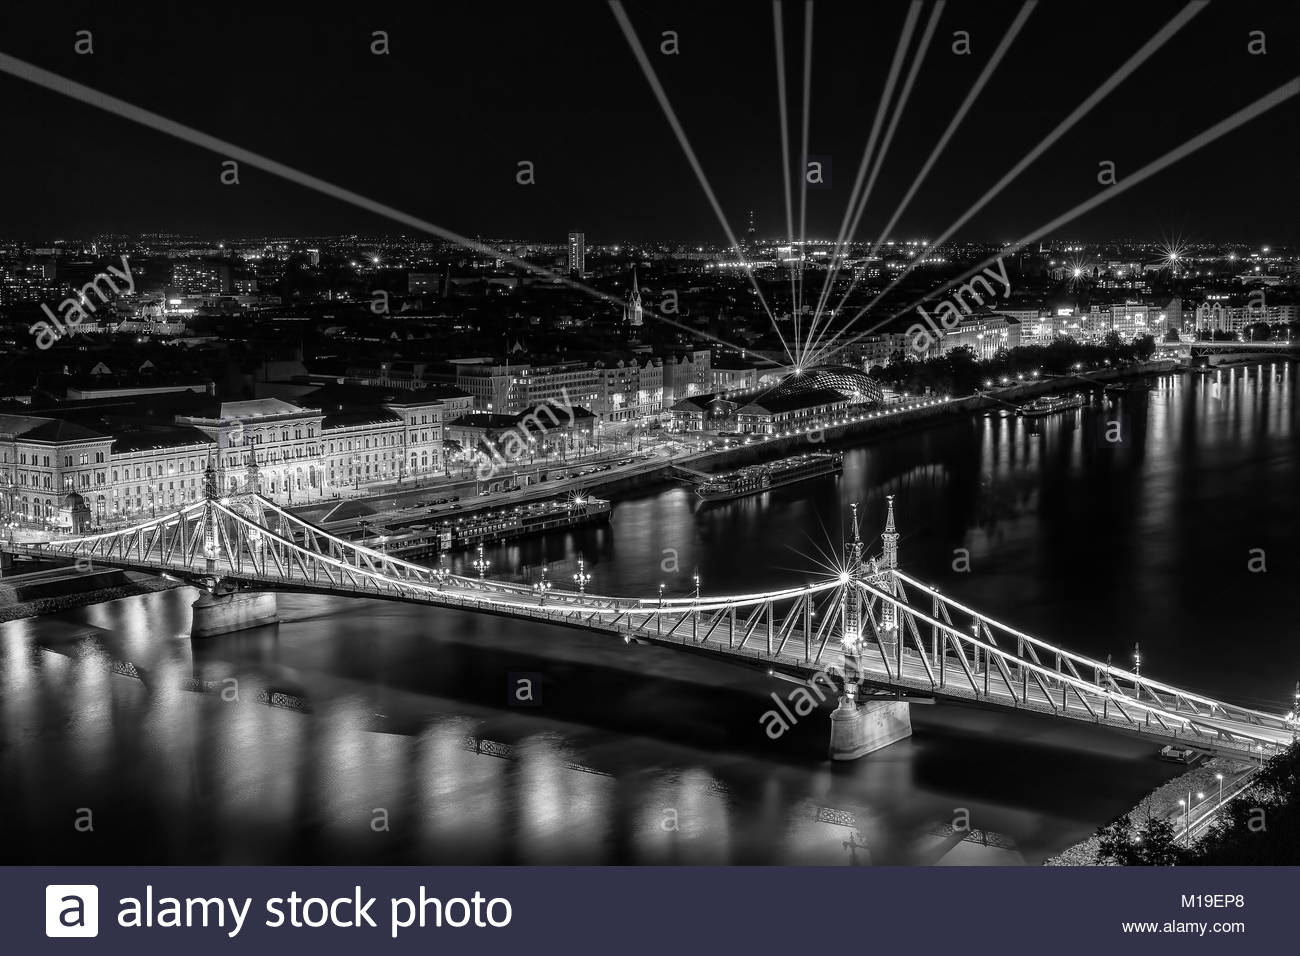 Liberty Bridge in Budapest. - Stock Image